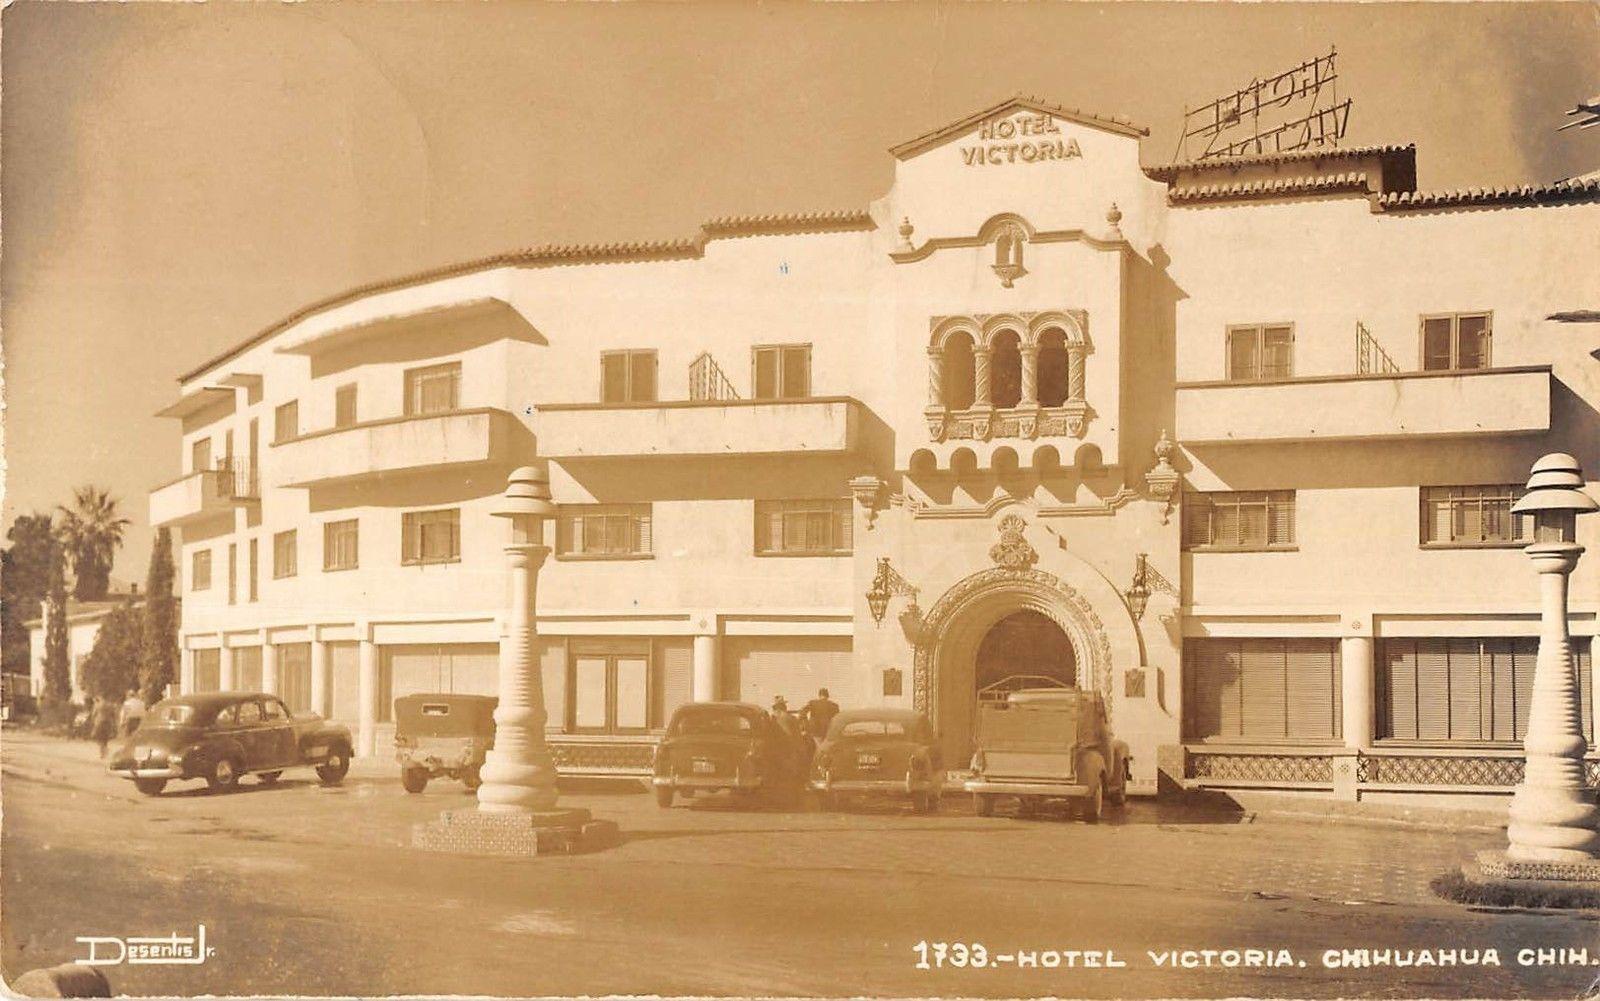 Chihuahua Mexico Street Scene Outside Hotel Victoria Real Photo Pc Y8969 Mary L Martin Ltd Postcards